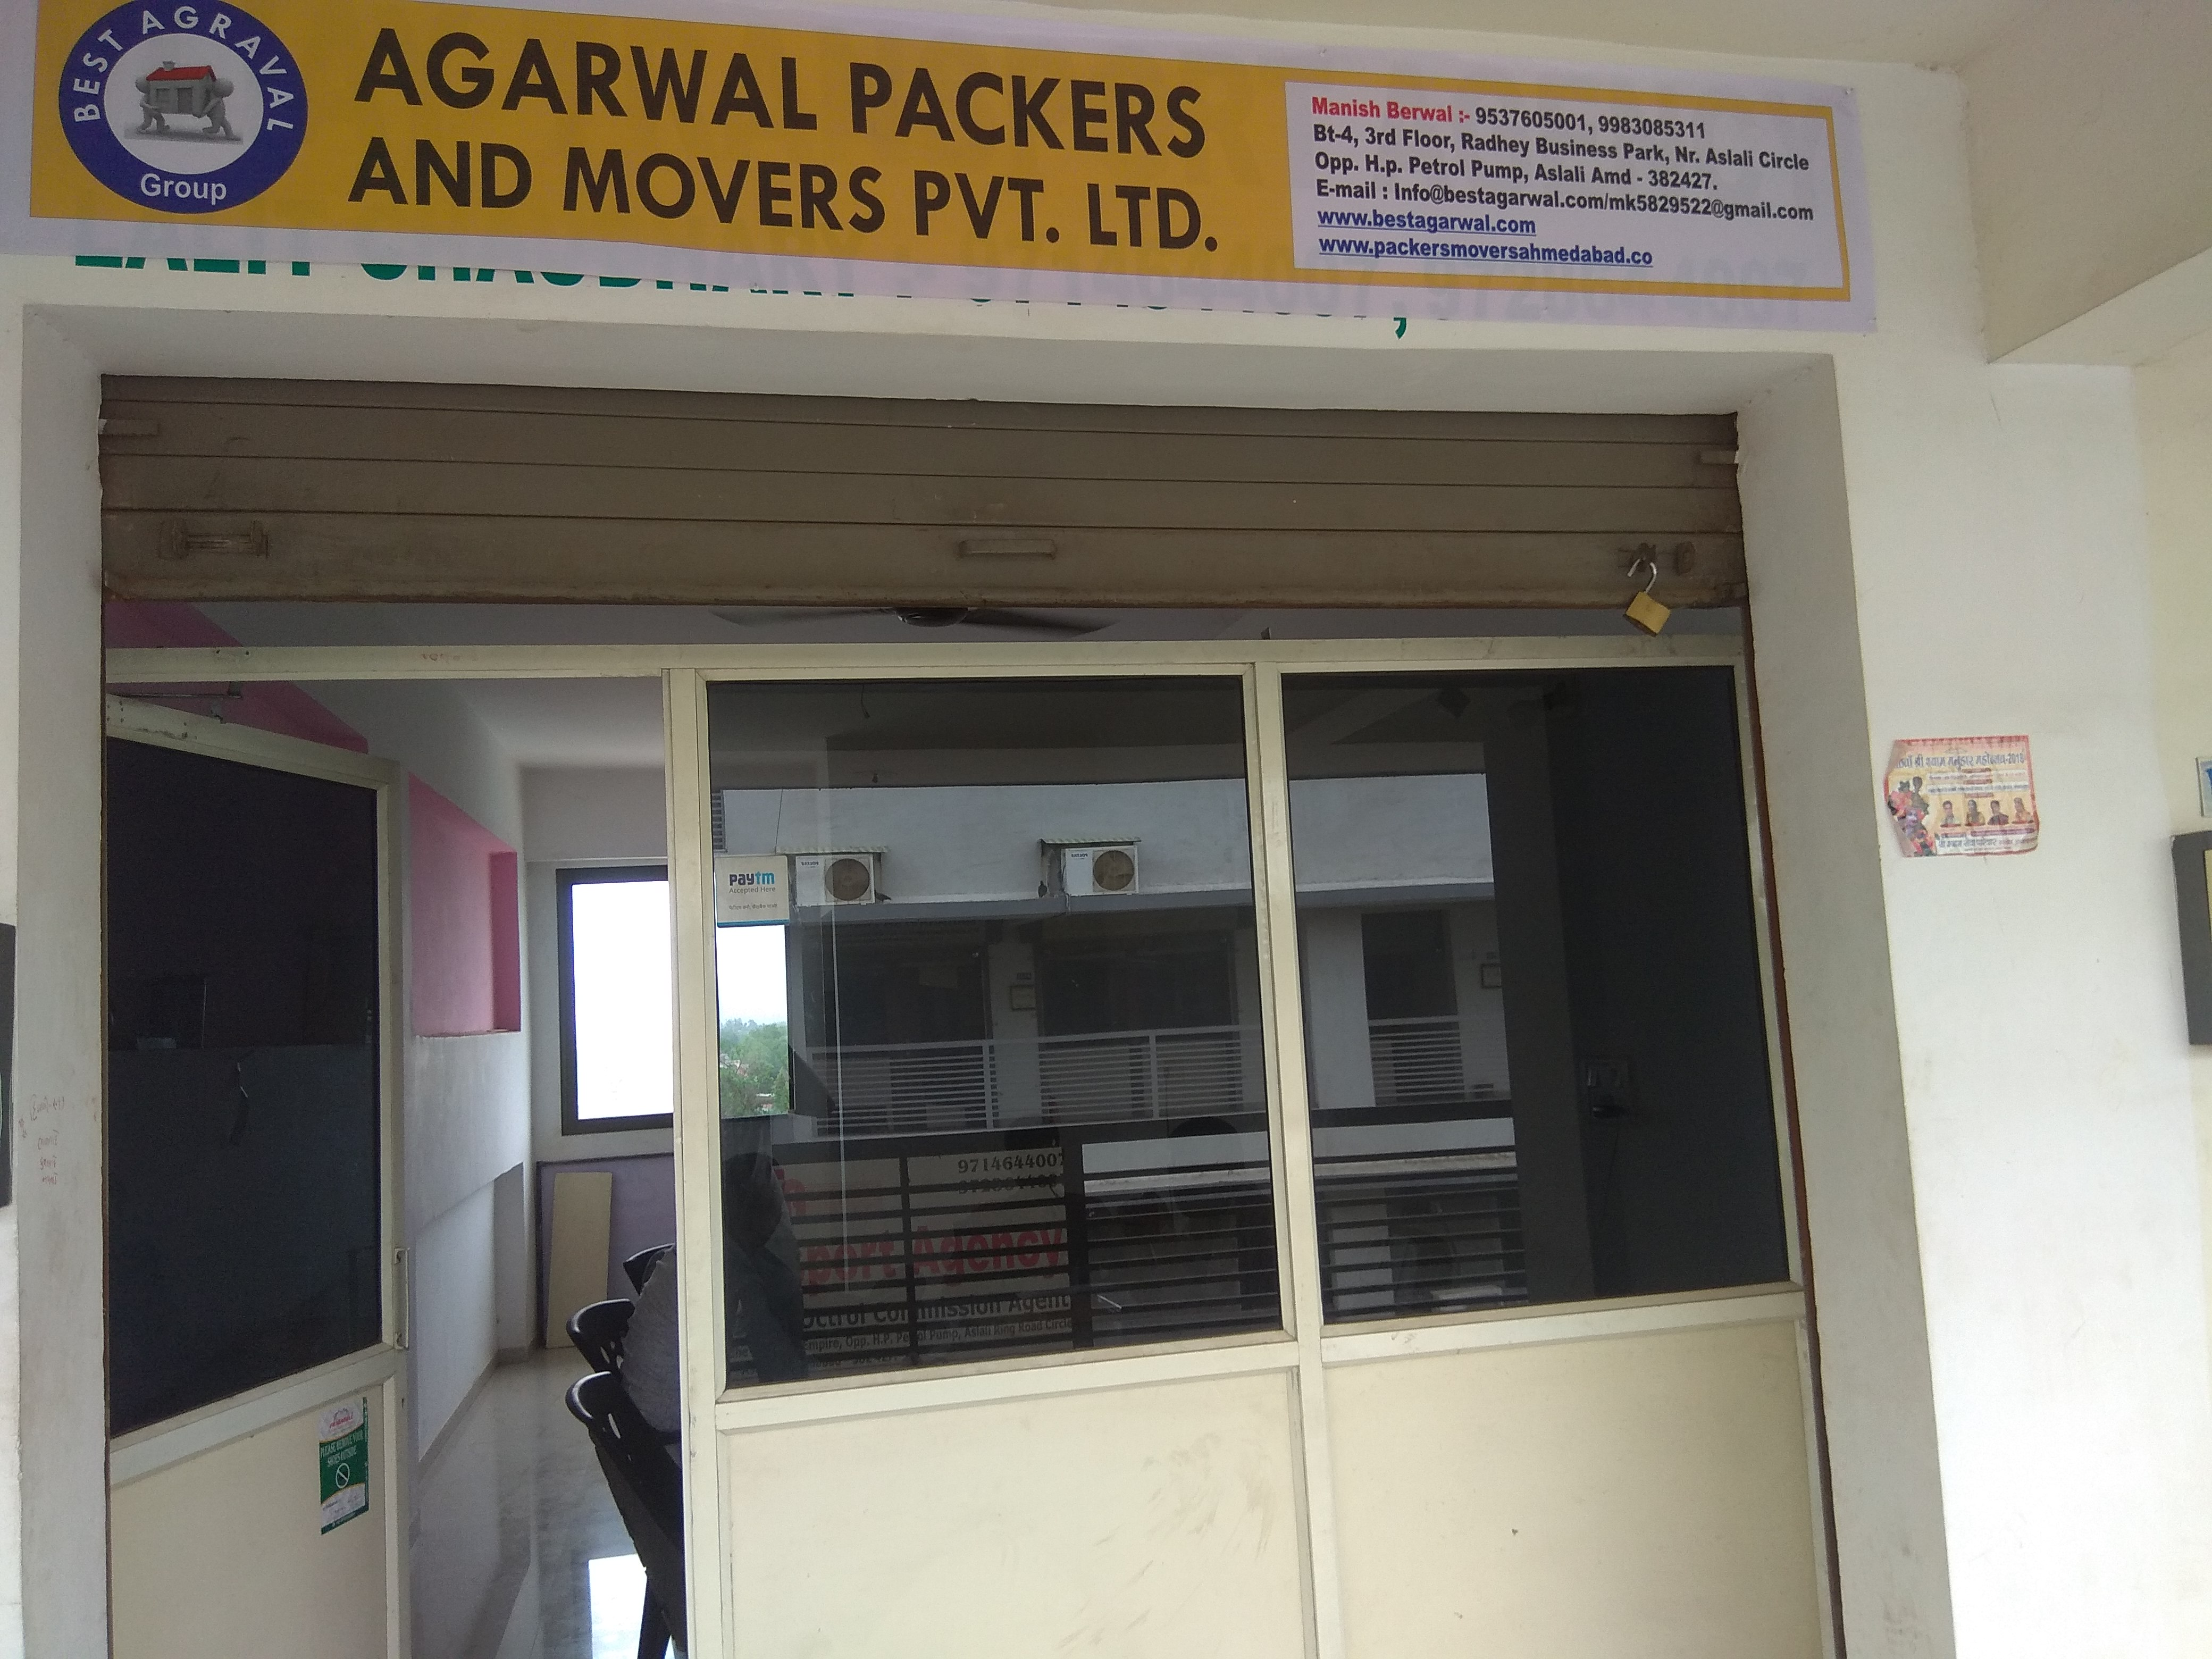 Agarwal Packers And Movers In Navrangpura Ahmedabad 382427 Sulekha Ahmedabad